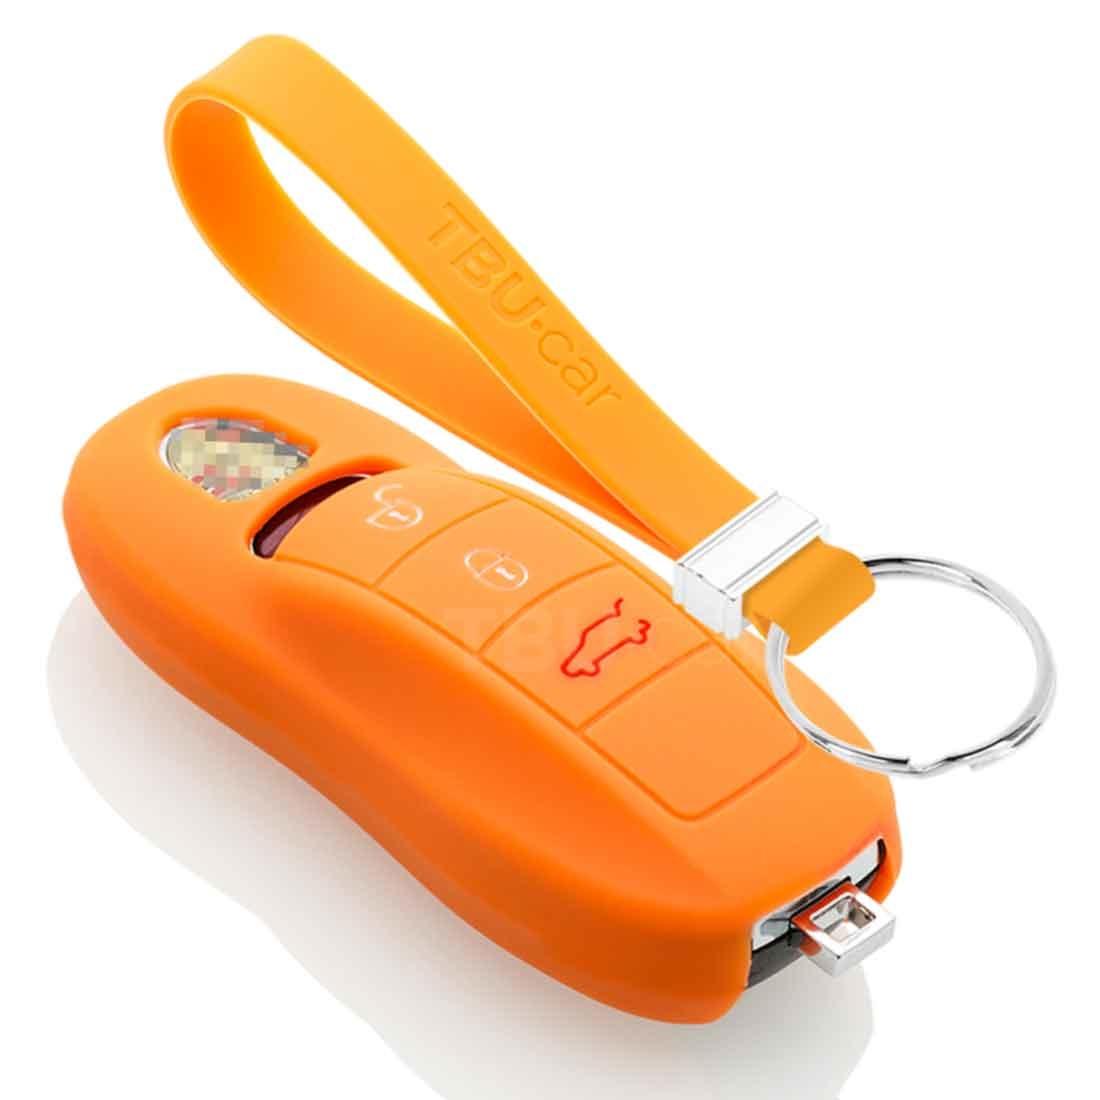 TBU car TBU car Autoschlüssel Hülle kompatibel mit Porsche 3 Tasten (Keyless Entry) - Schutzhülle aus Silikon - Auto Schlüsselhülle Cover in Orange